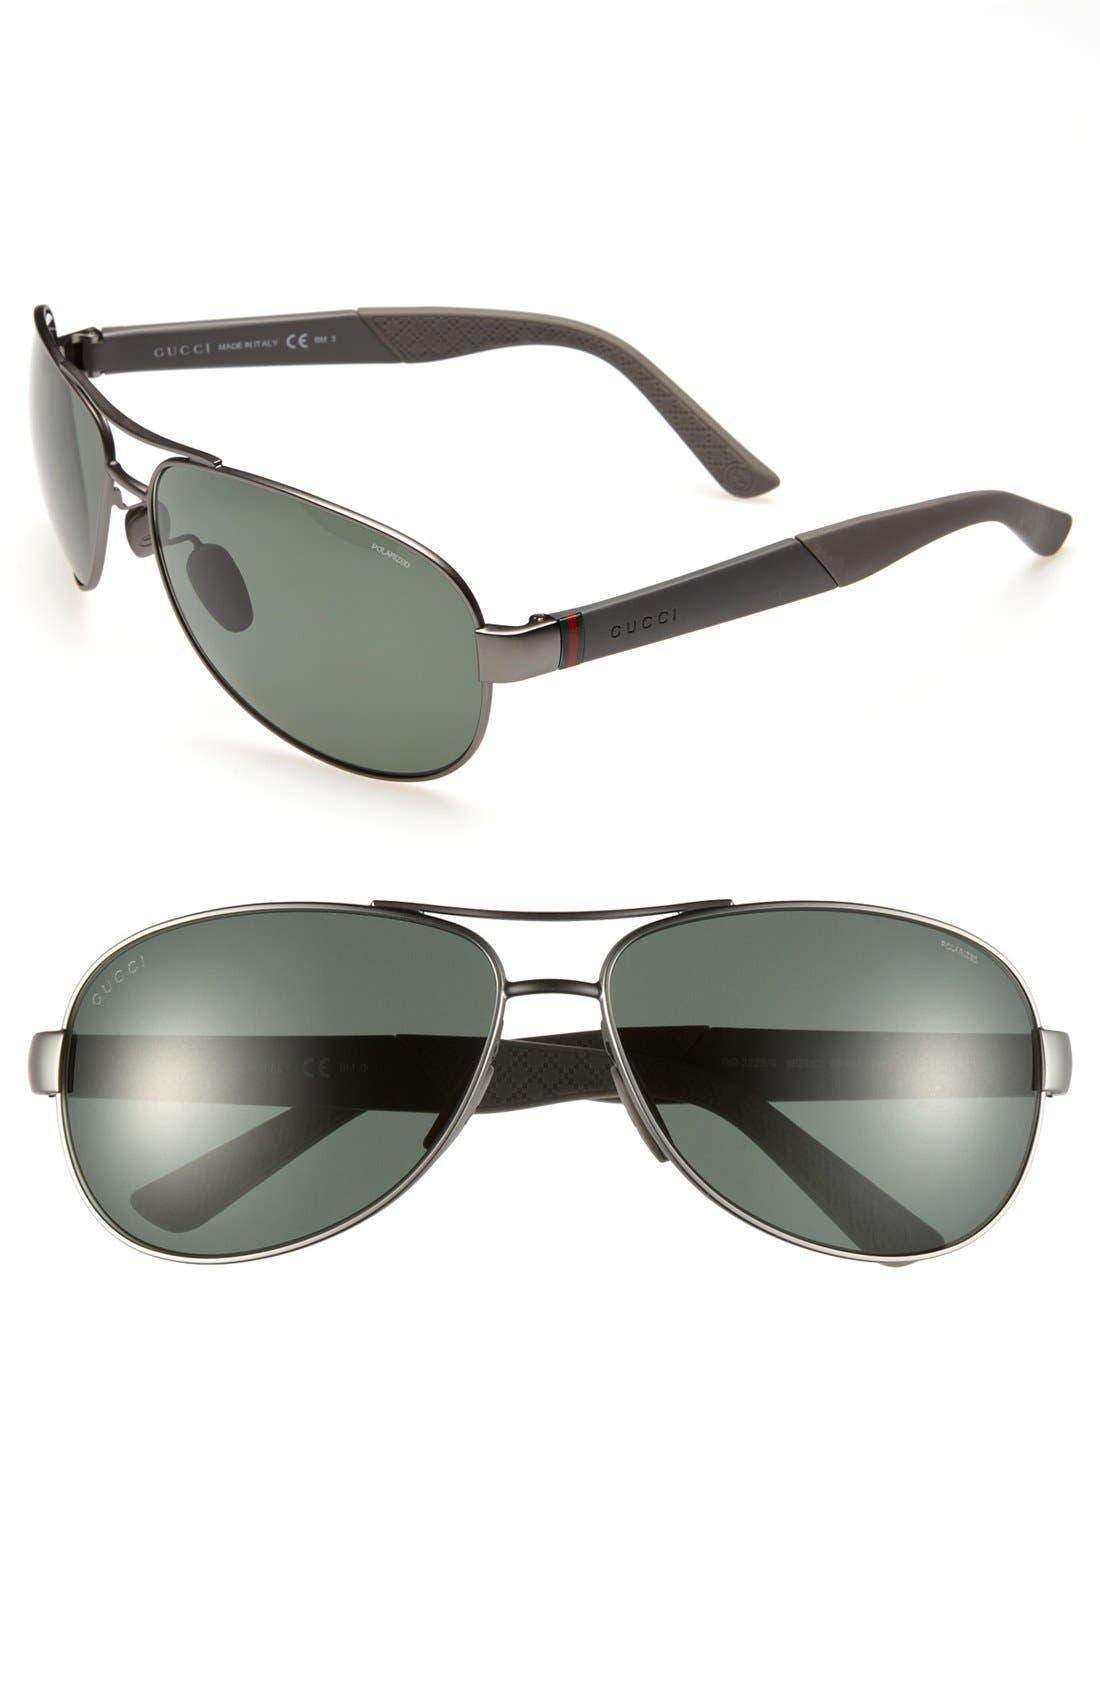 Main Image - Gucci Polarized 63mm Sunglasses